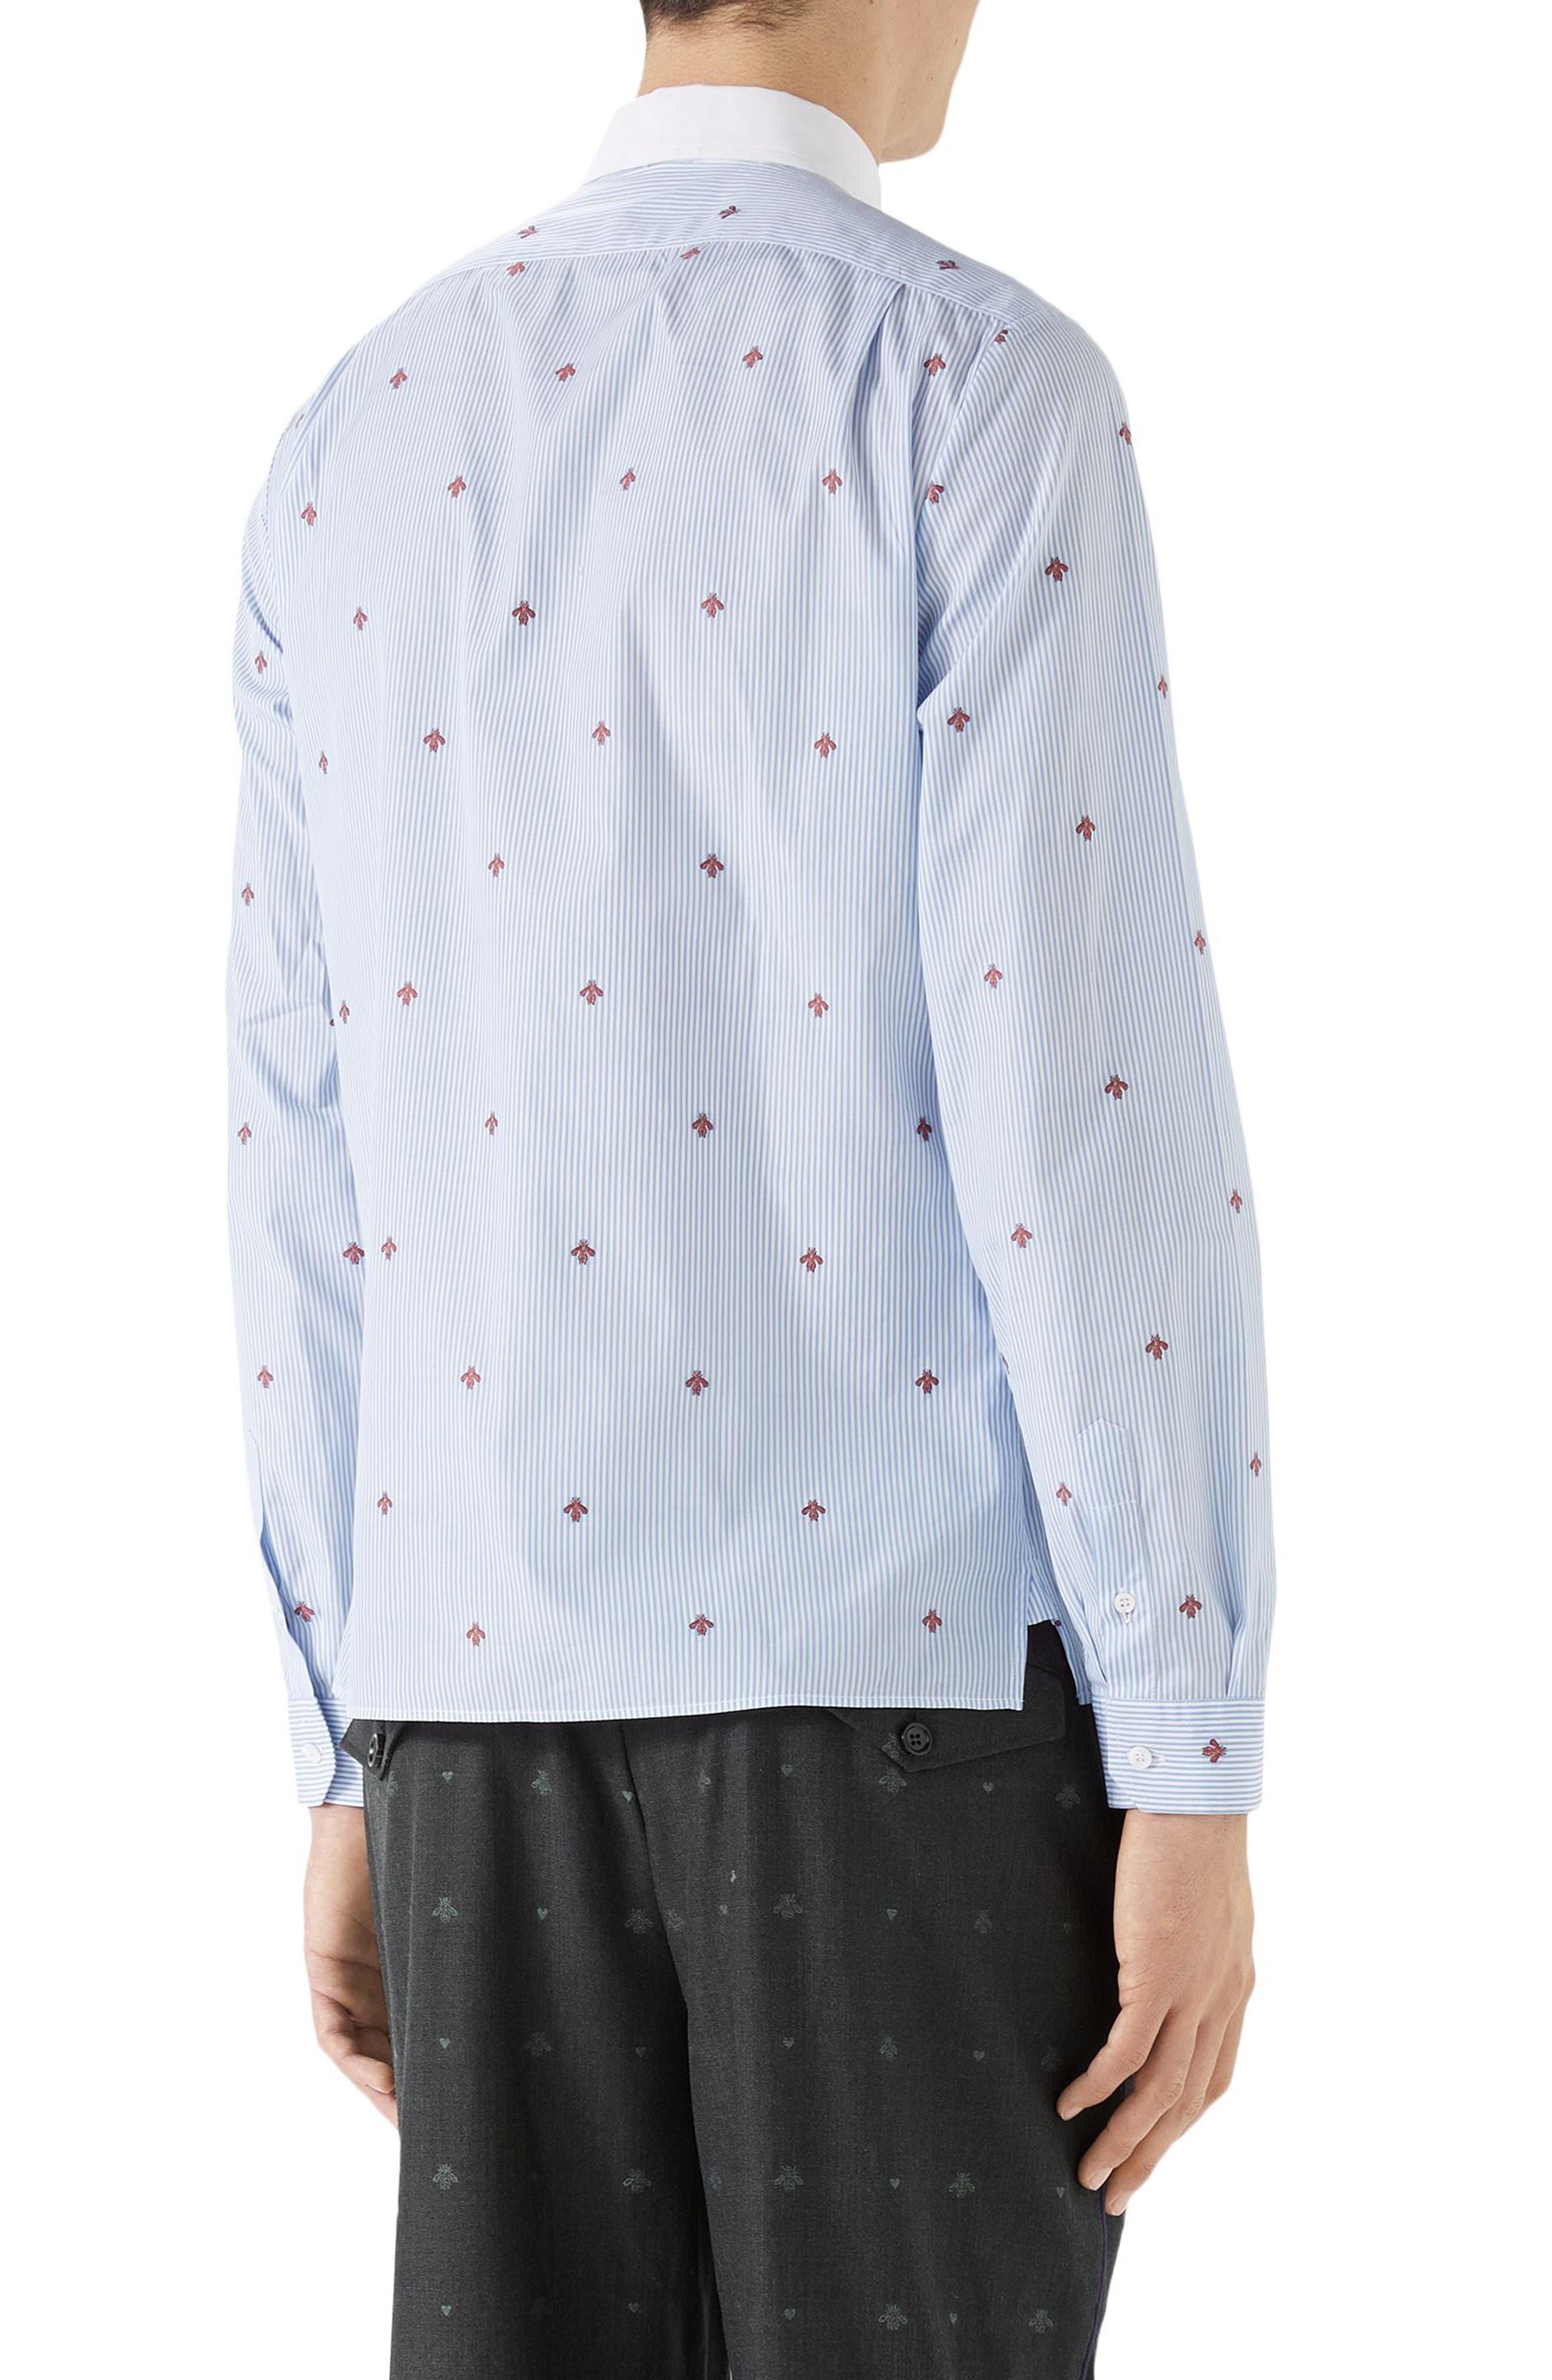 Bee Fil Coupé Sport Shirt,                             Alternate thumbnail 2, color,                             Sky Blue/ White